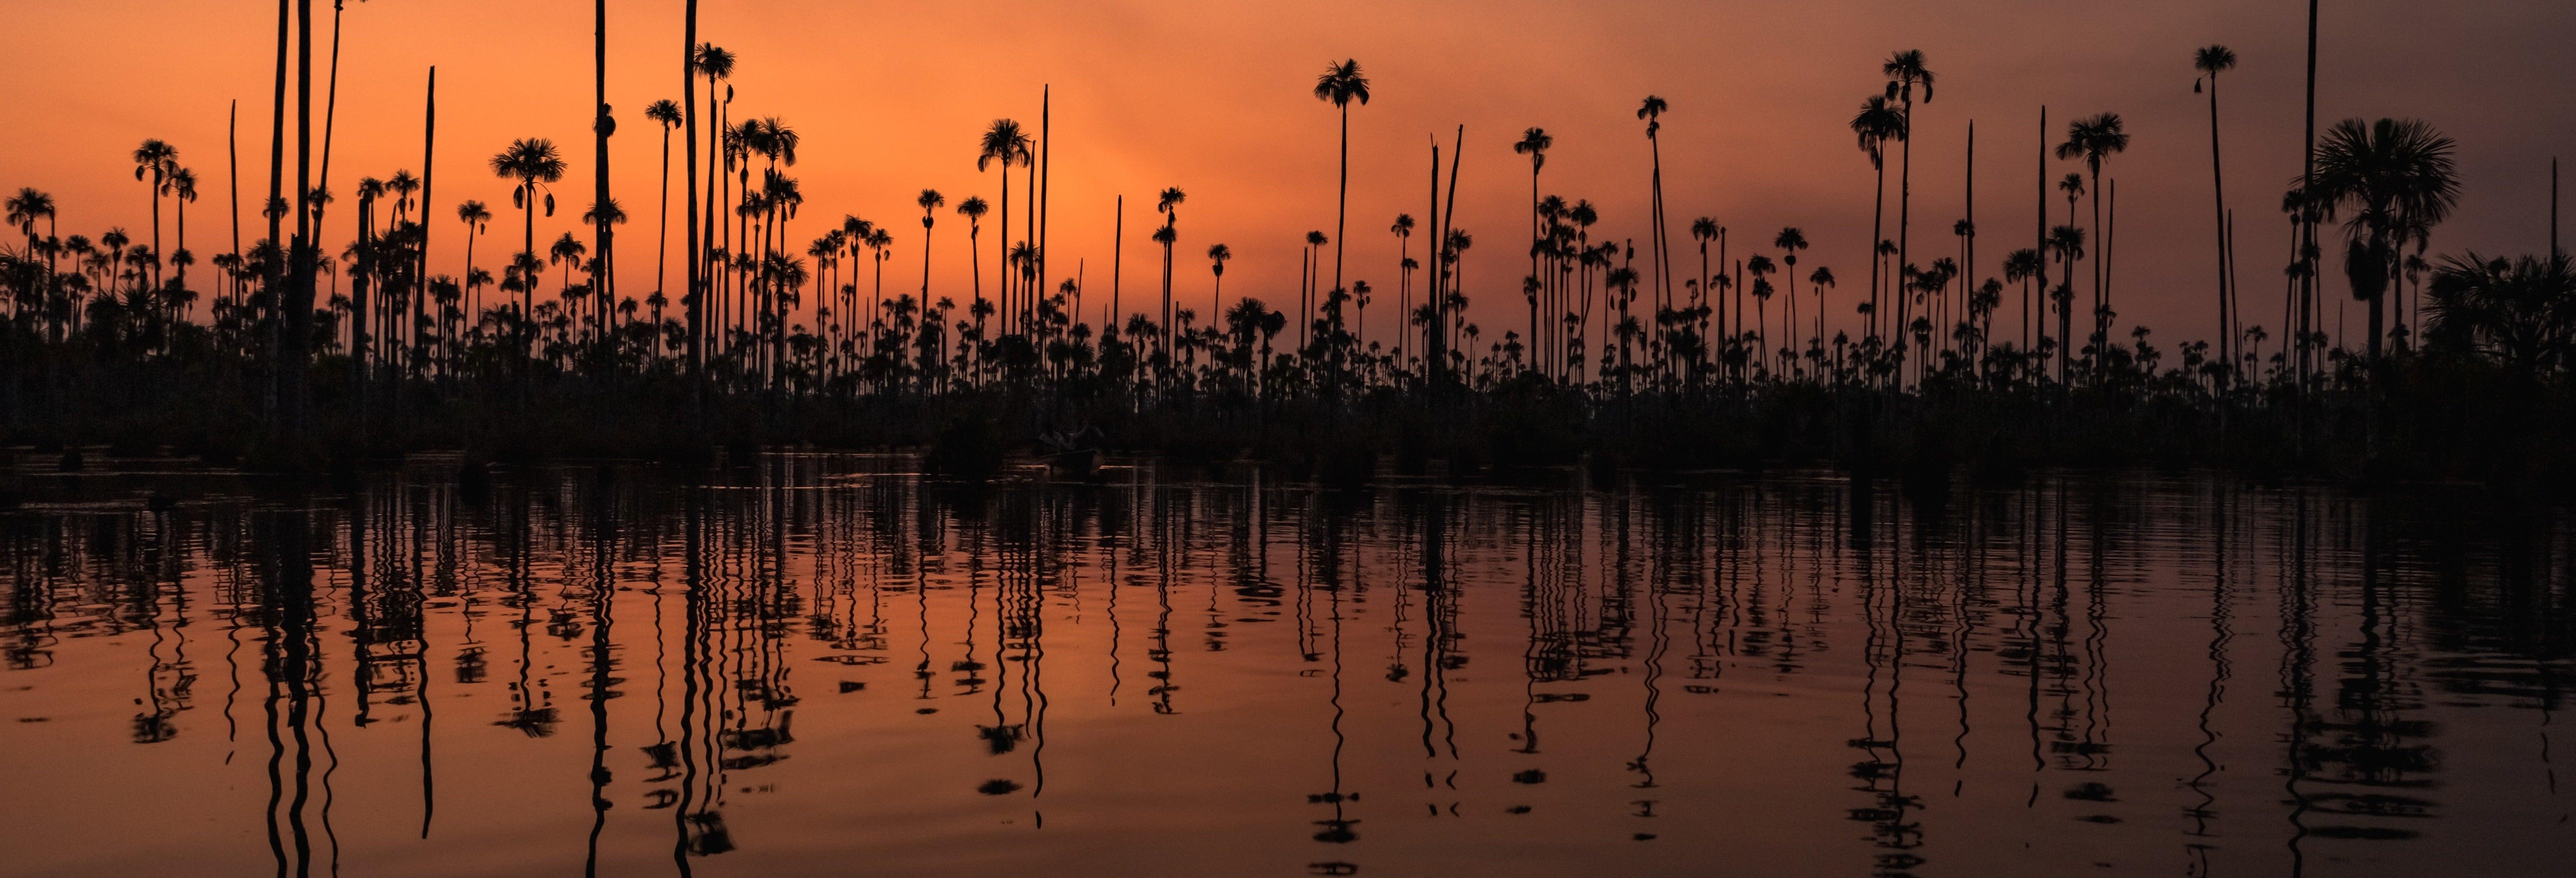 Trilha noturna pela selva amazônica